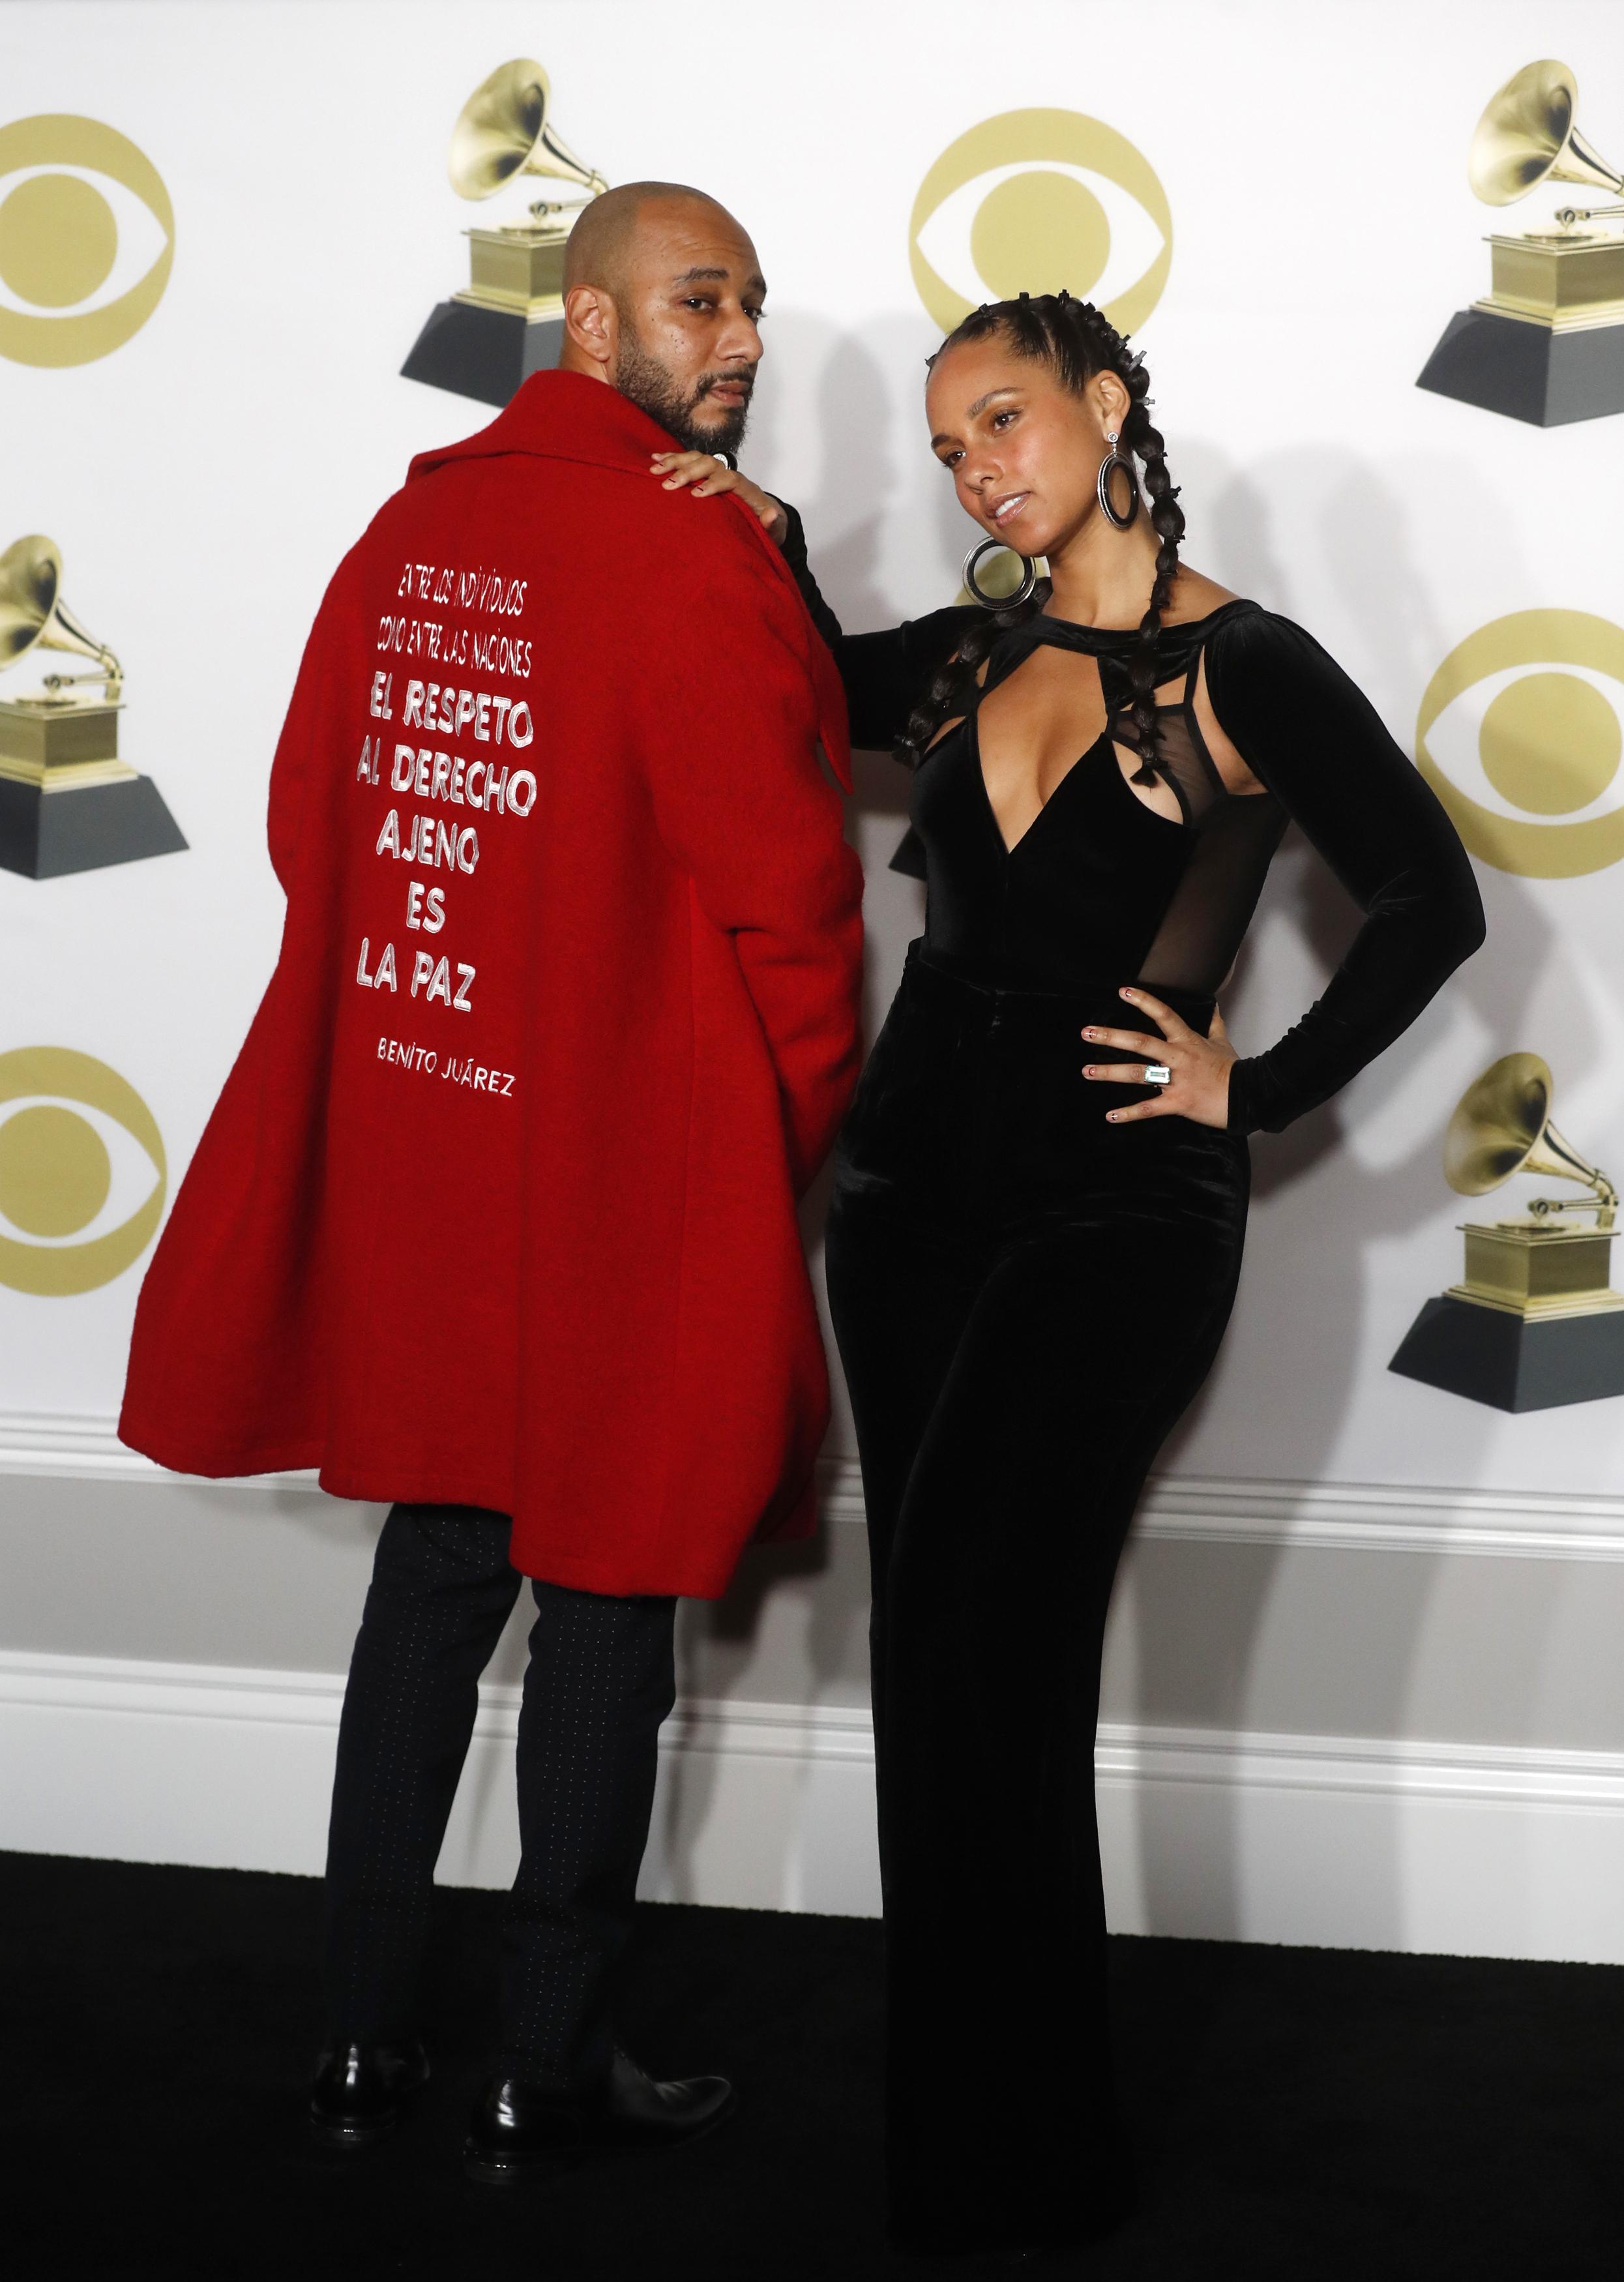 60th Annual Grammy Awards  Photo Room  New York, U.S., 28/01/2018  Swizz Beatz and Alicia Keys. REUTERS/Carlo Allegri - HP1EE1T06Y6DX